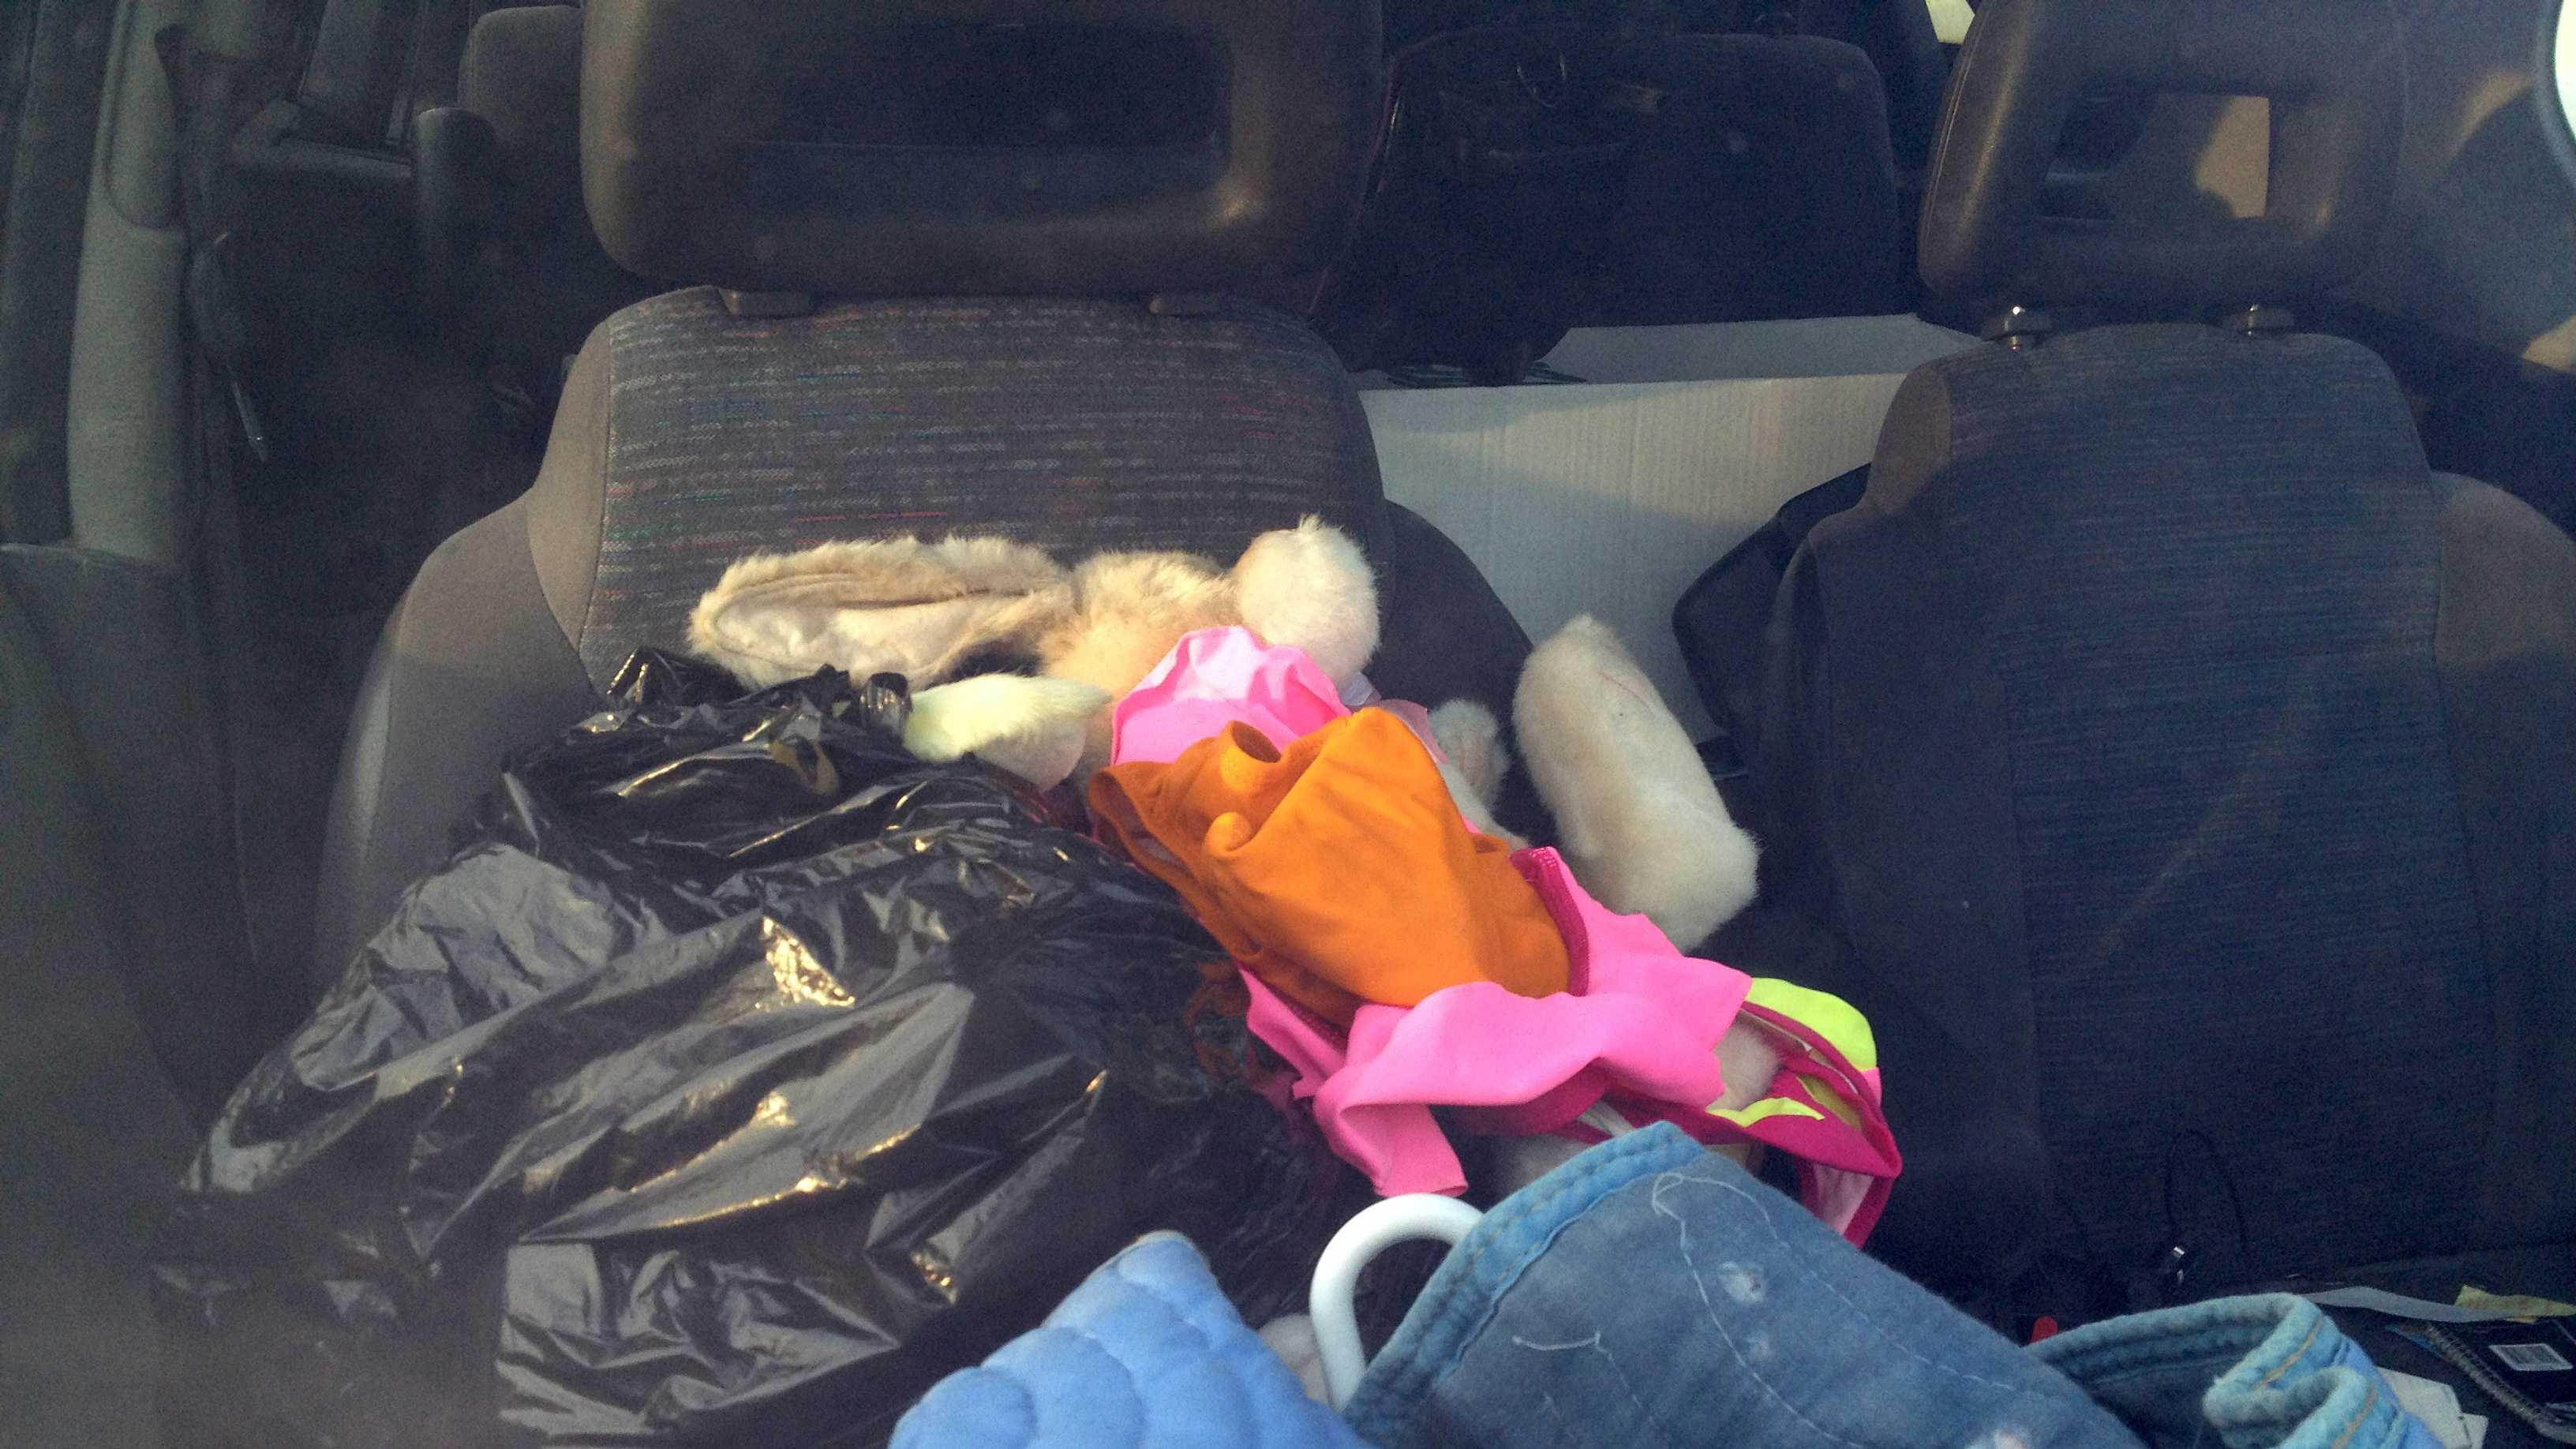 Stuffed Animals in Suspect's Car